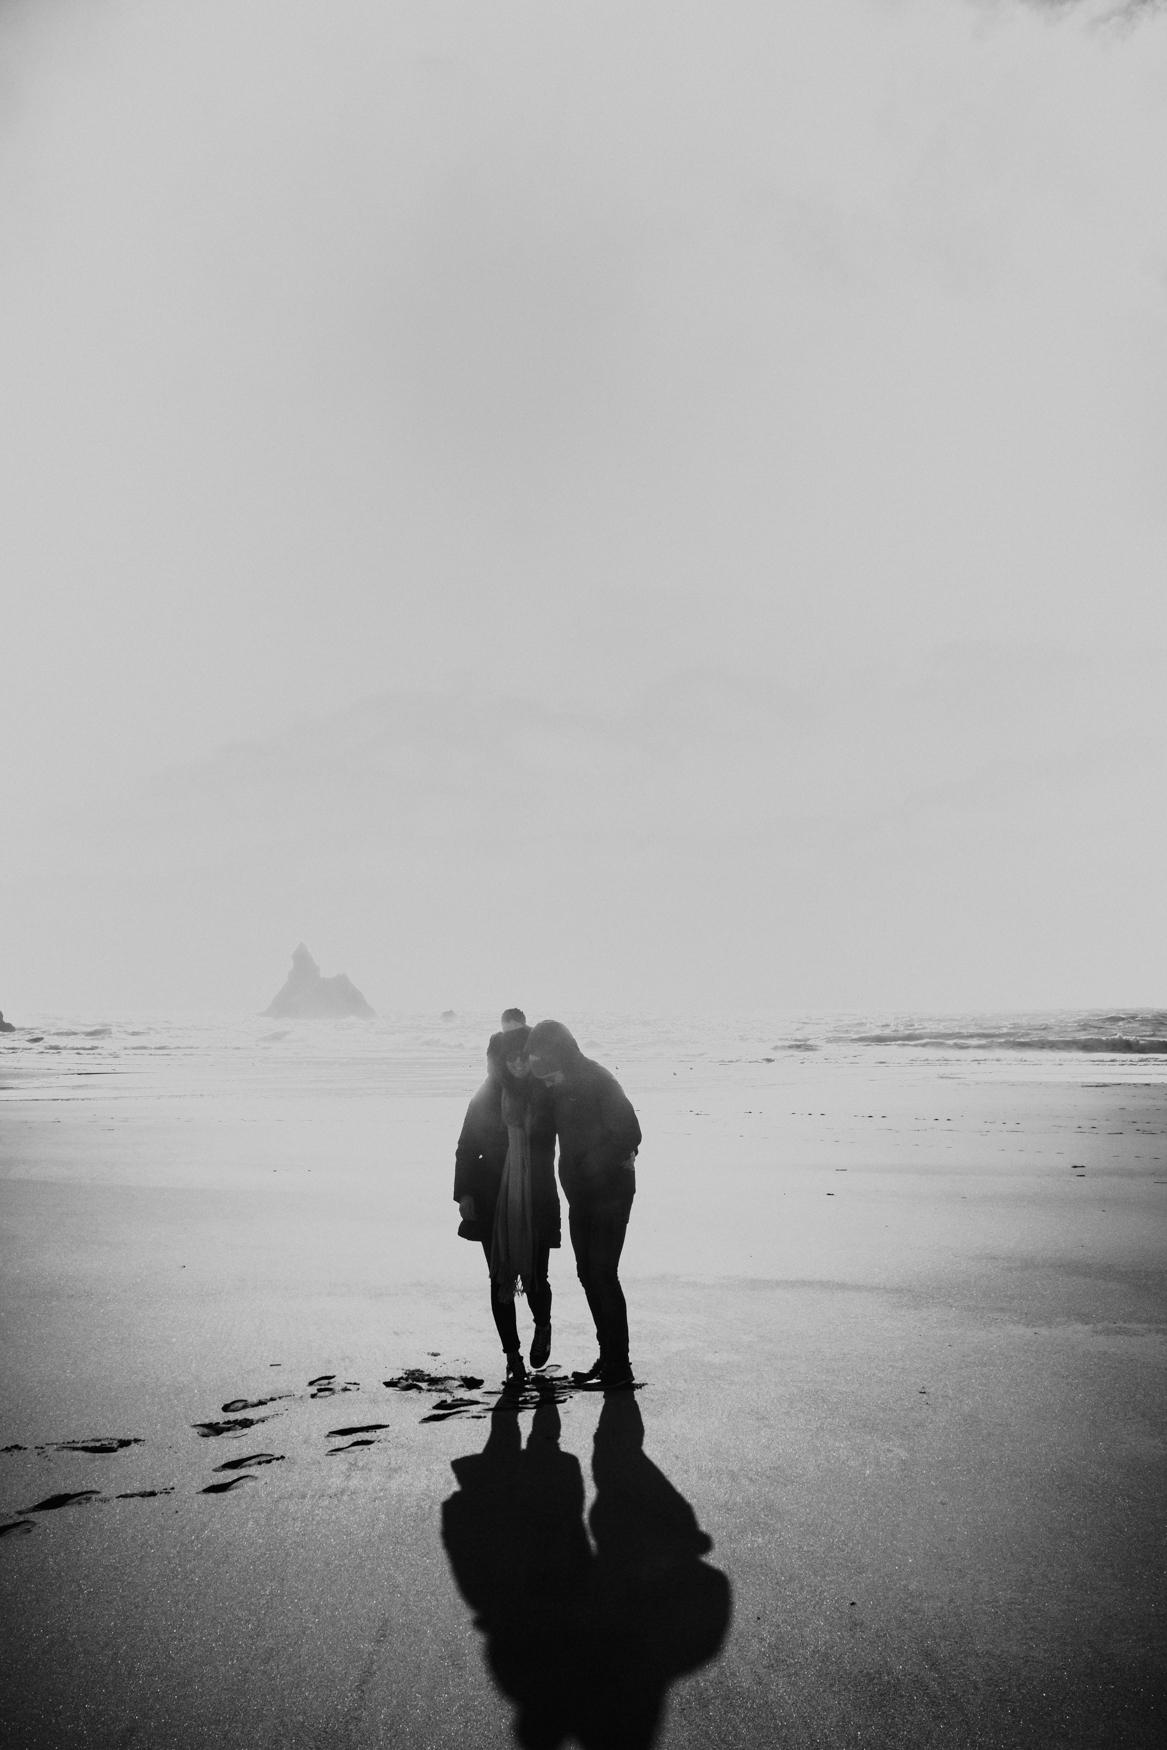 Alex-Sedgmond-Photography-Cardiff-Prewedding-Photography-Castlemartin-Pembrokeshire-WestWales-22.JPG